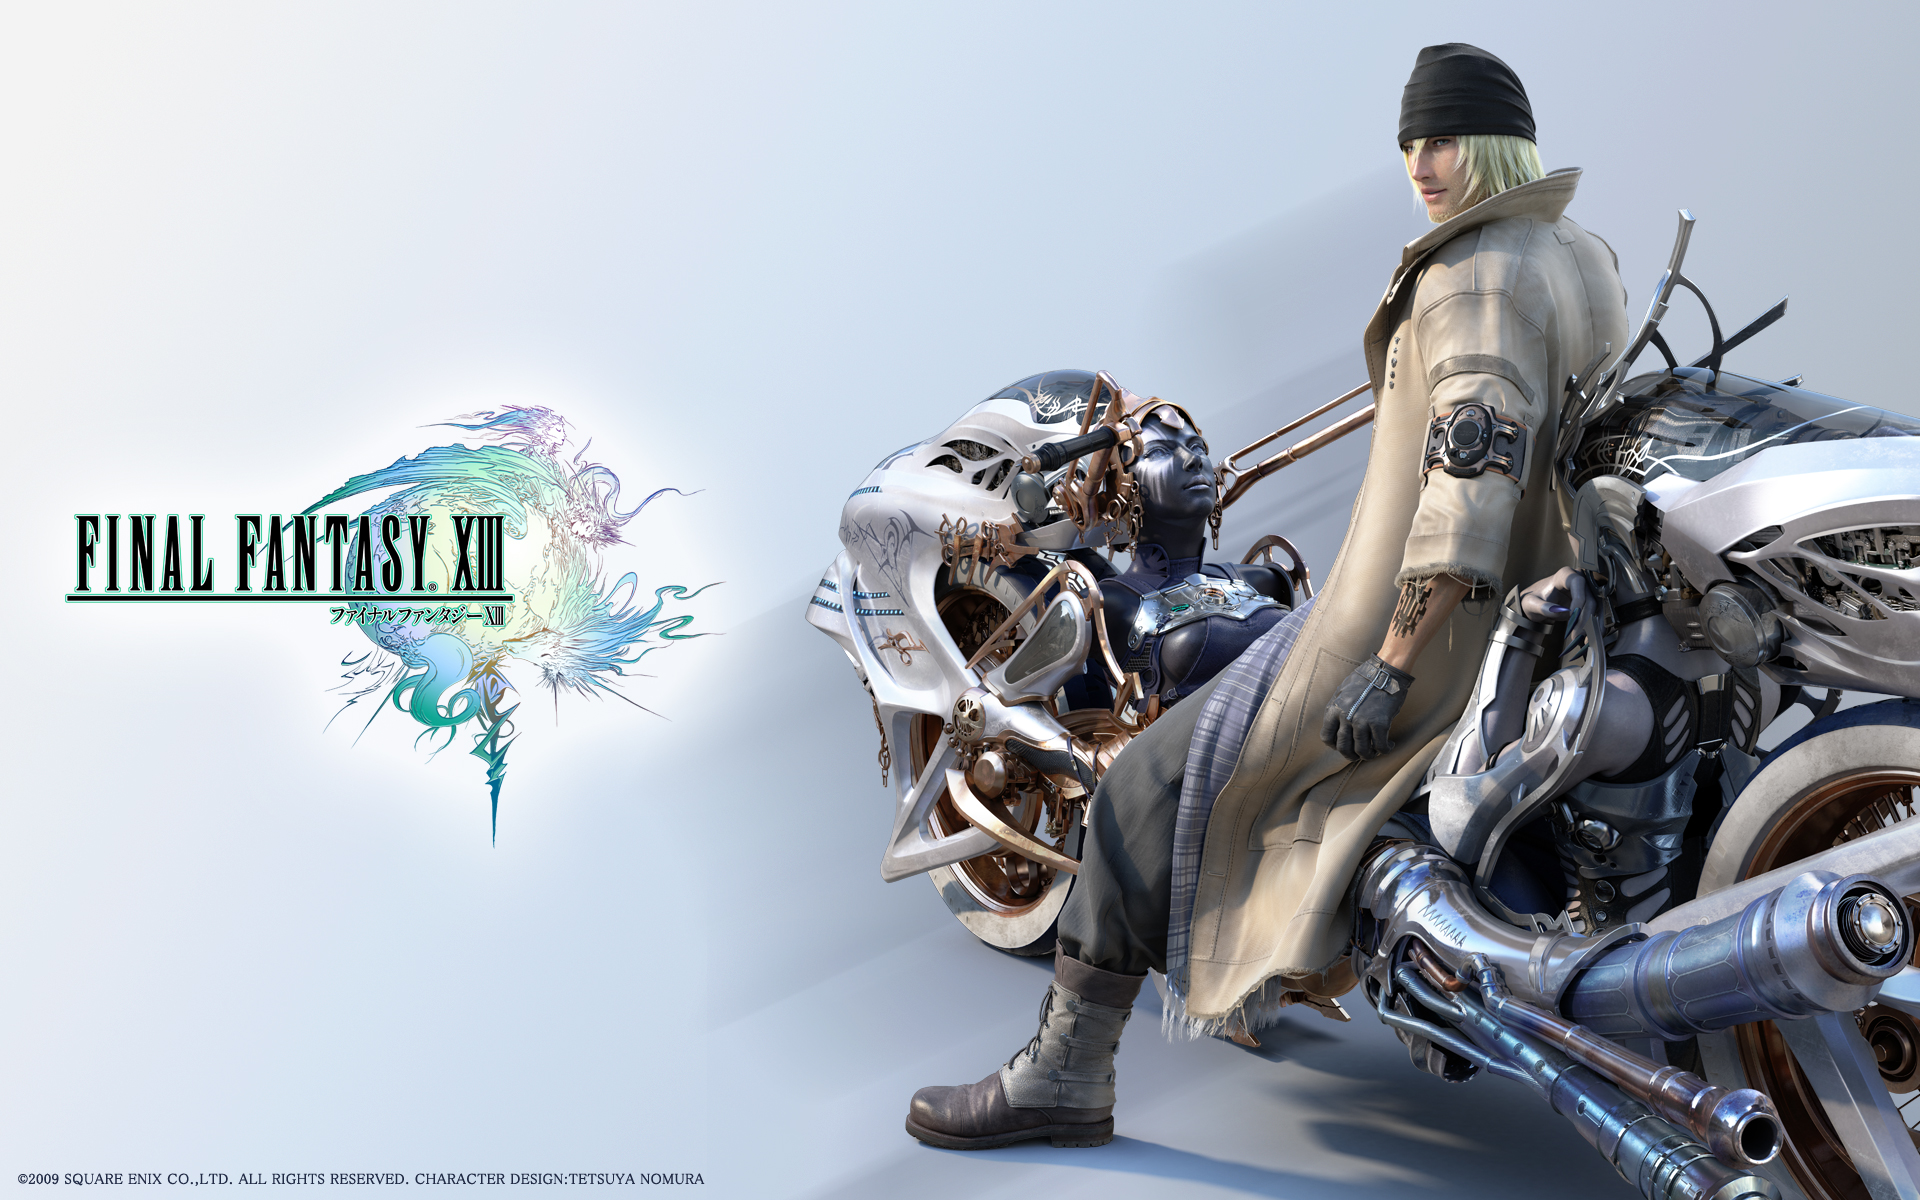 Final Fantasy Xiii wallpaper - 68557